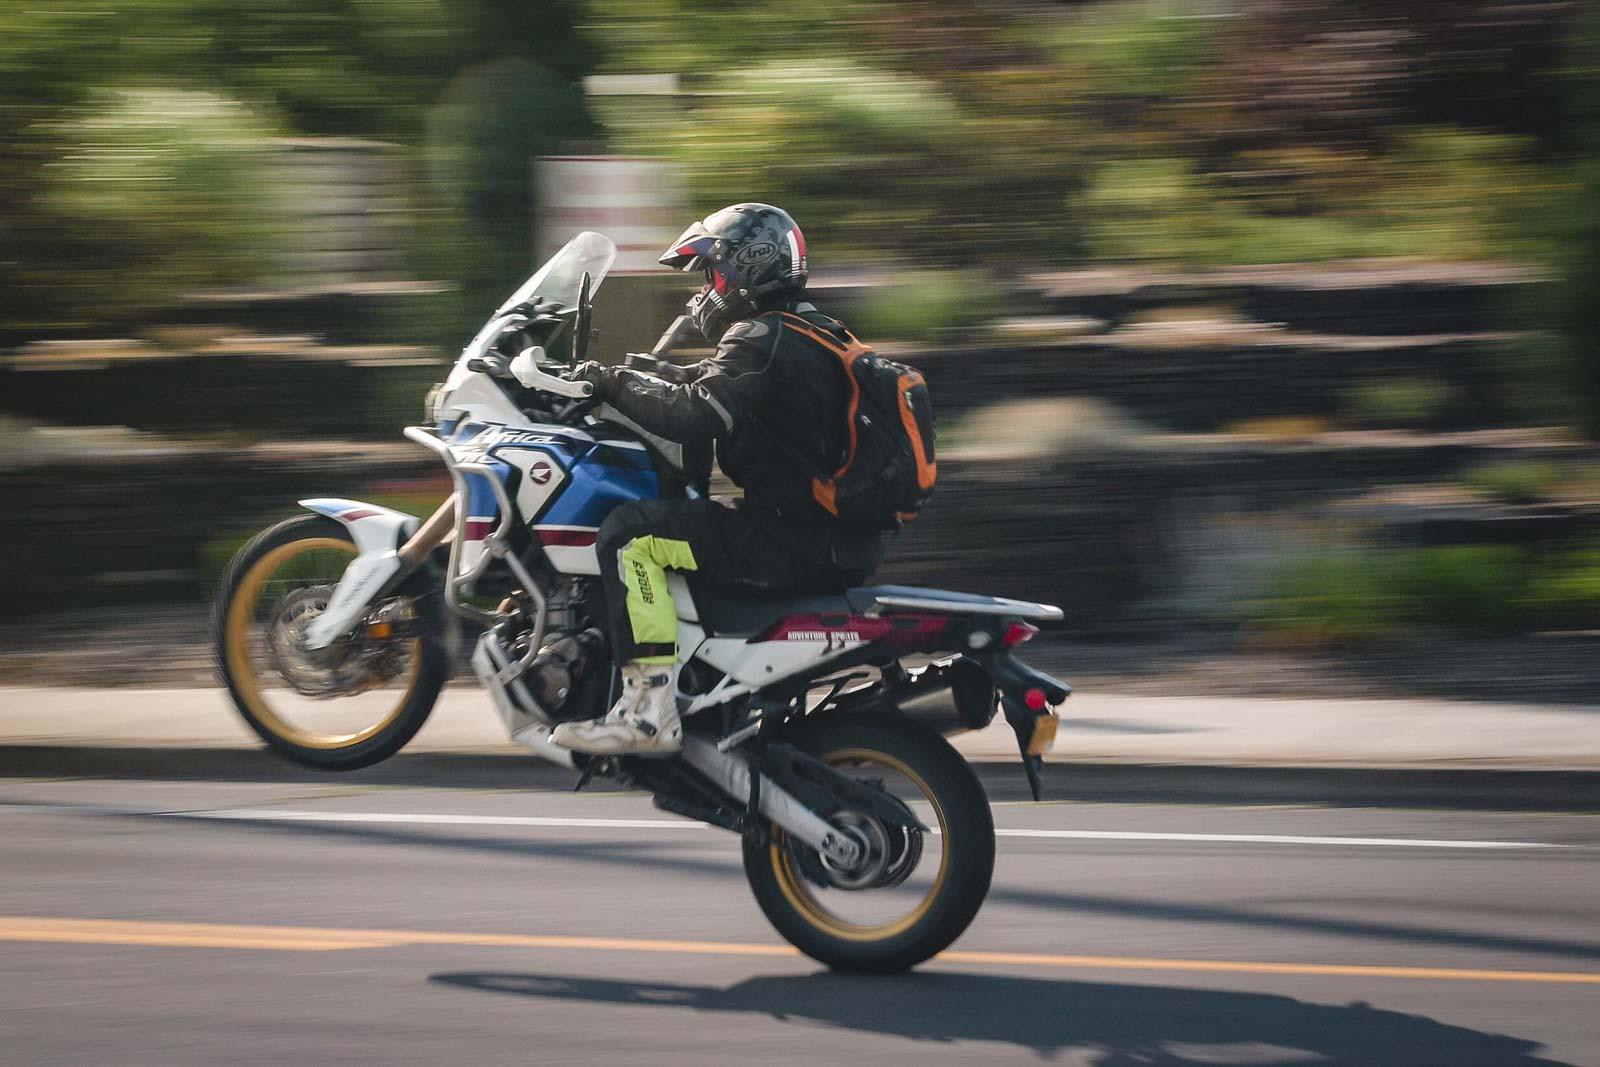 wheelie-in-bend-adventure-motorcycle-tour-oregon